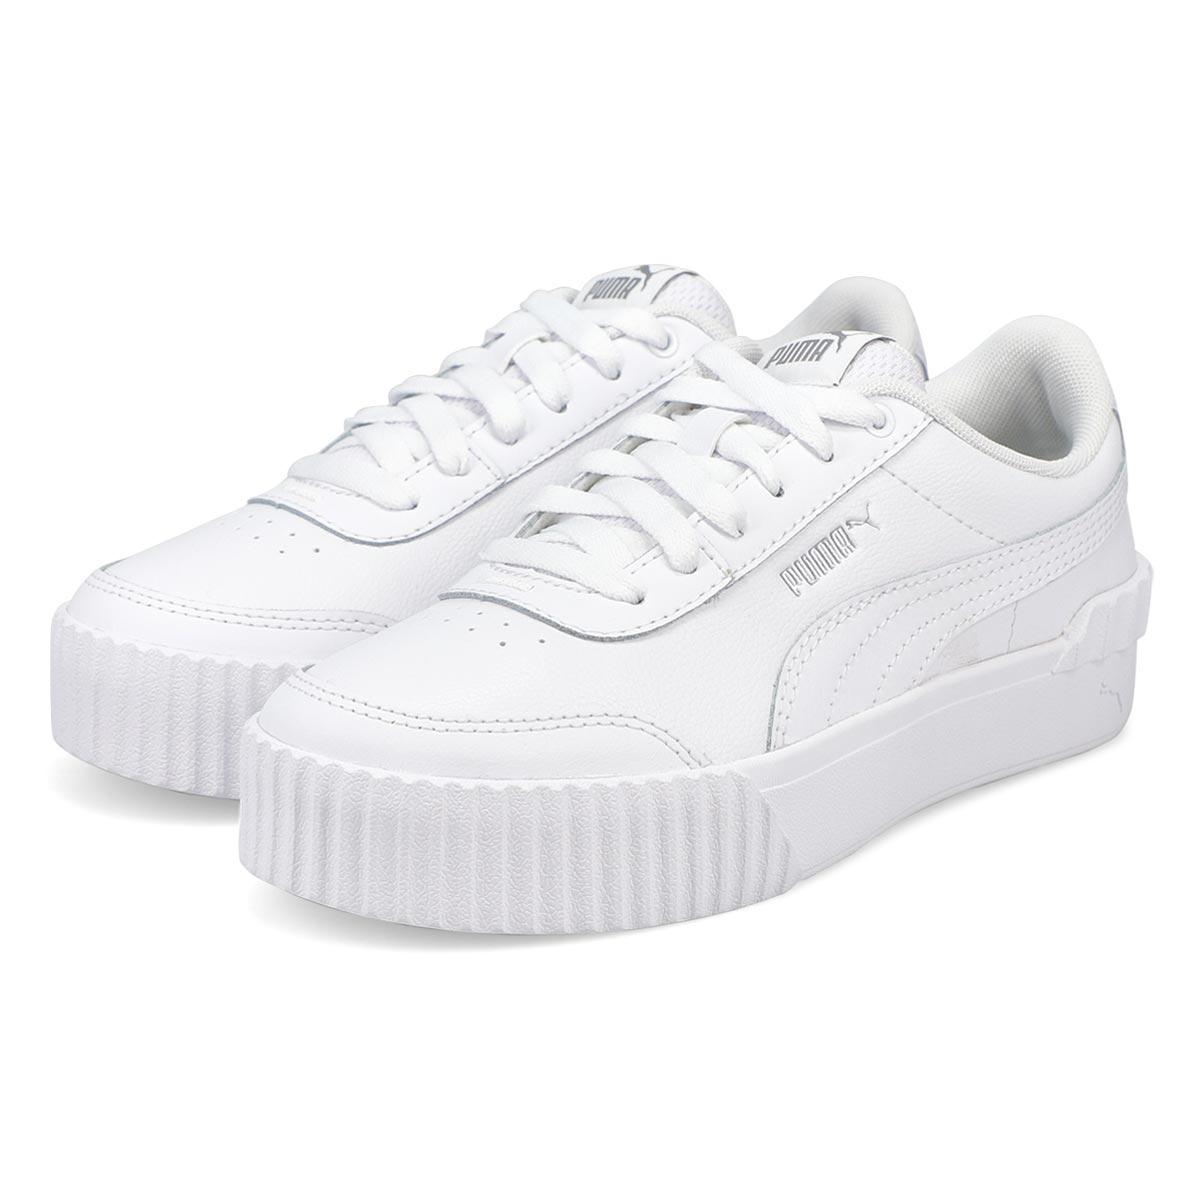 Women's Carina Lift TW Sneaker - White